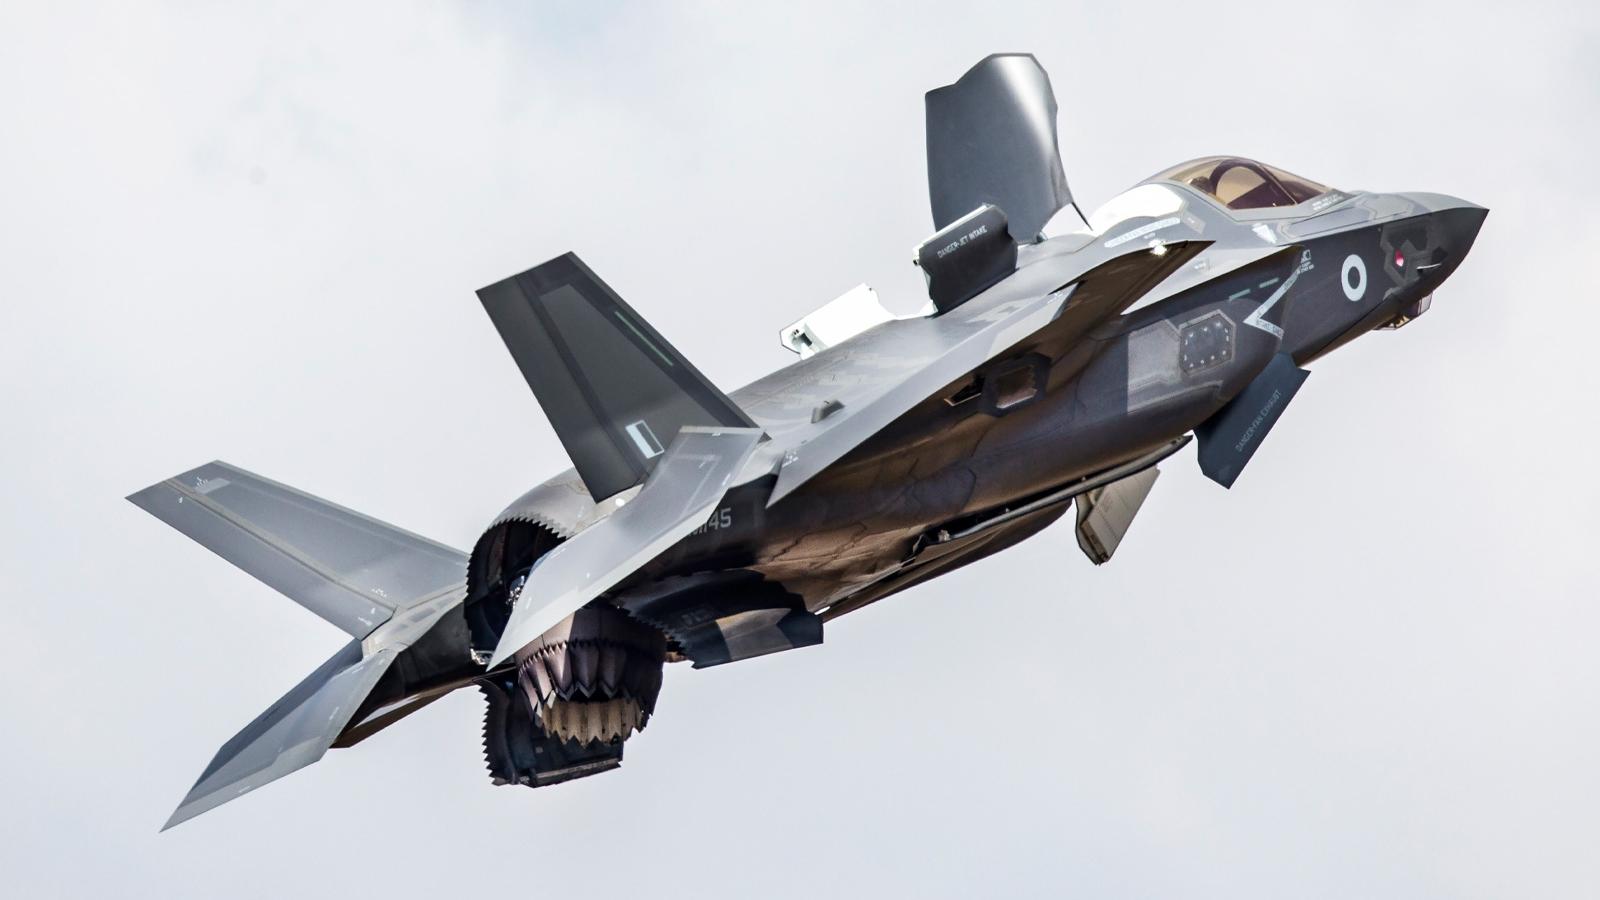 F35 Fixed Wing Inzpire